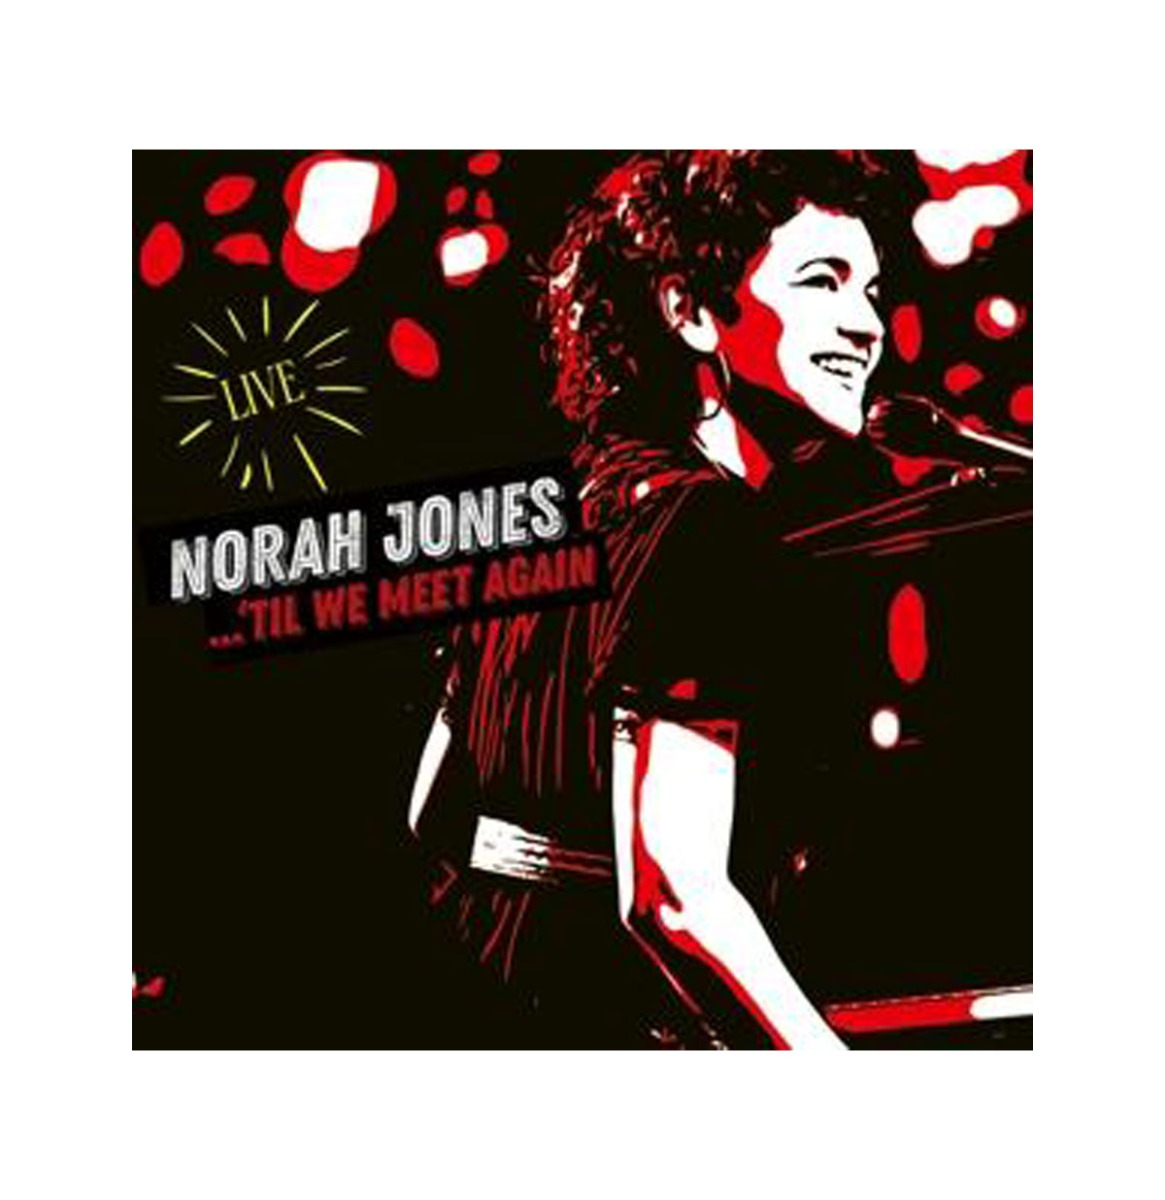 Norah Jones - 'Til We Meet Again Live 2 LP